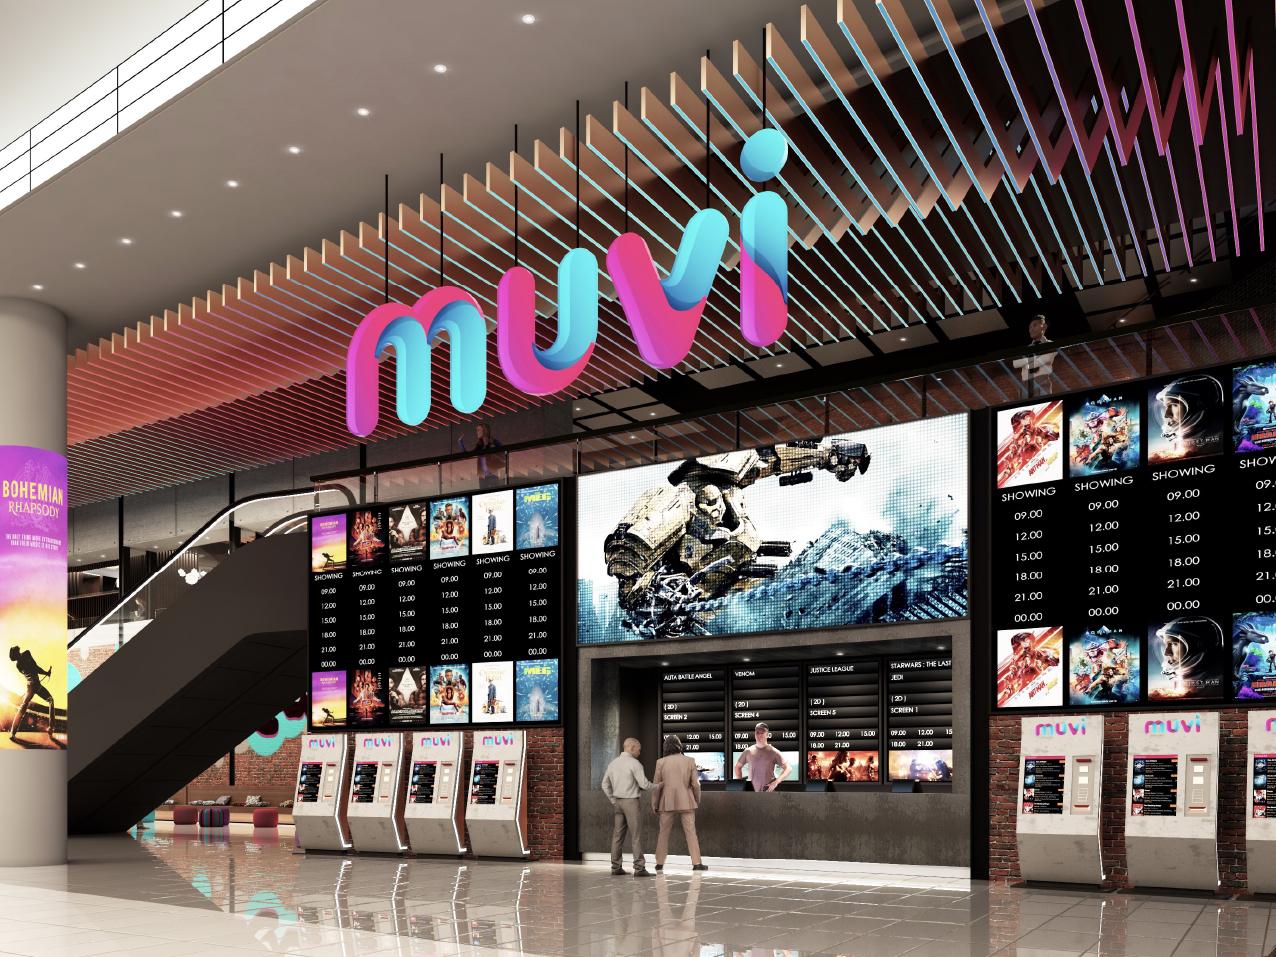 Saudi Cinema Brand Muvi Inks Deal For Malls Expansion Arabianbusiness